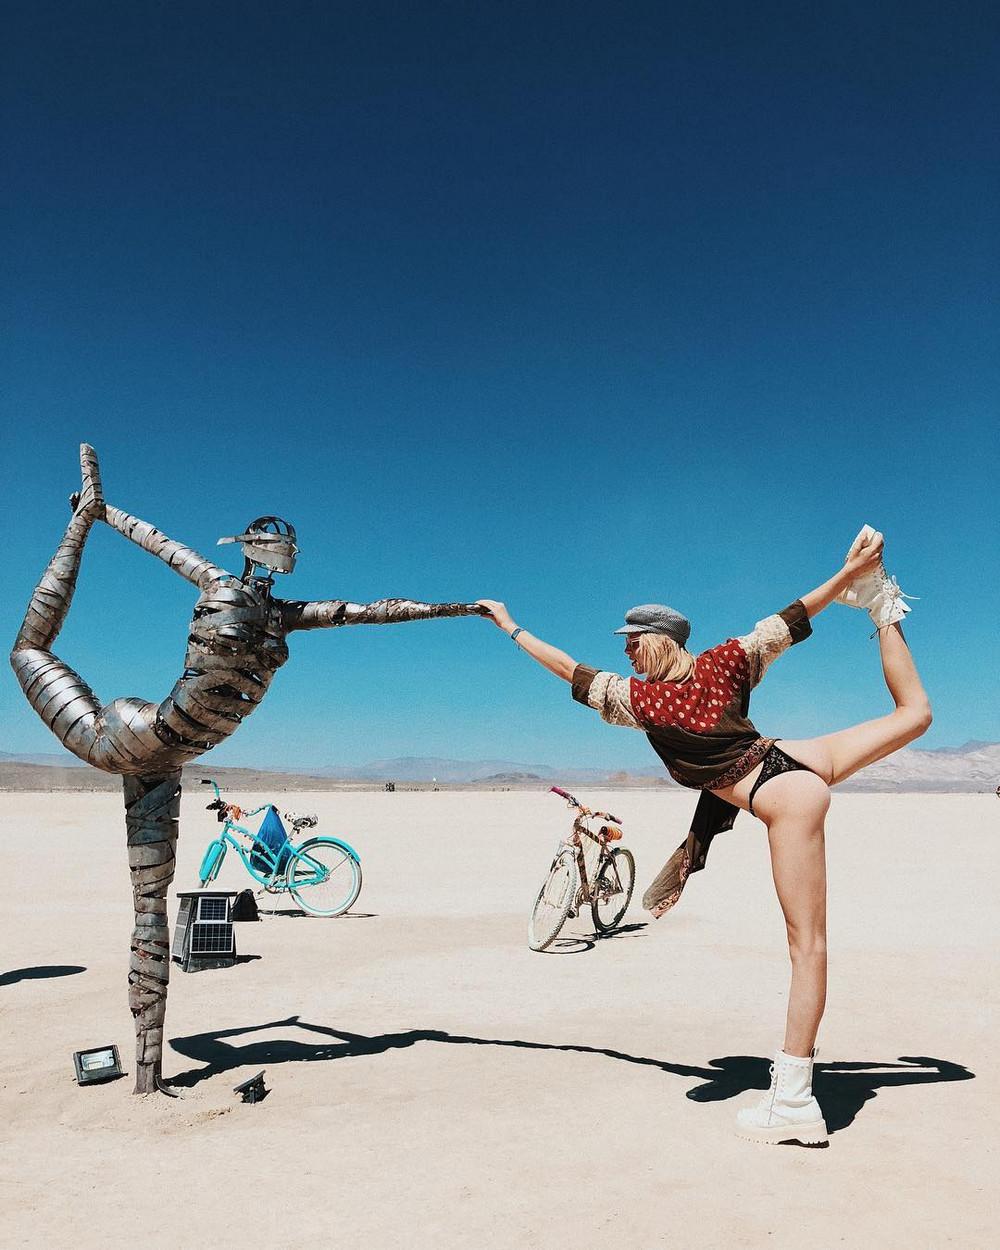 fotografii-festivalya-Burning-Man-2018_7